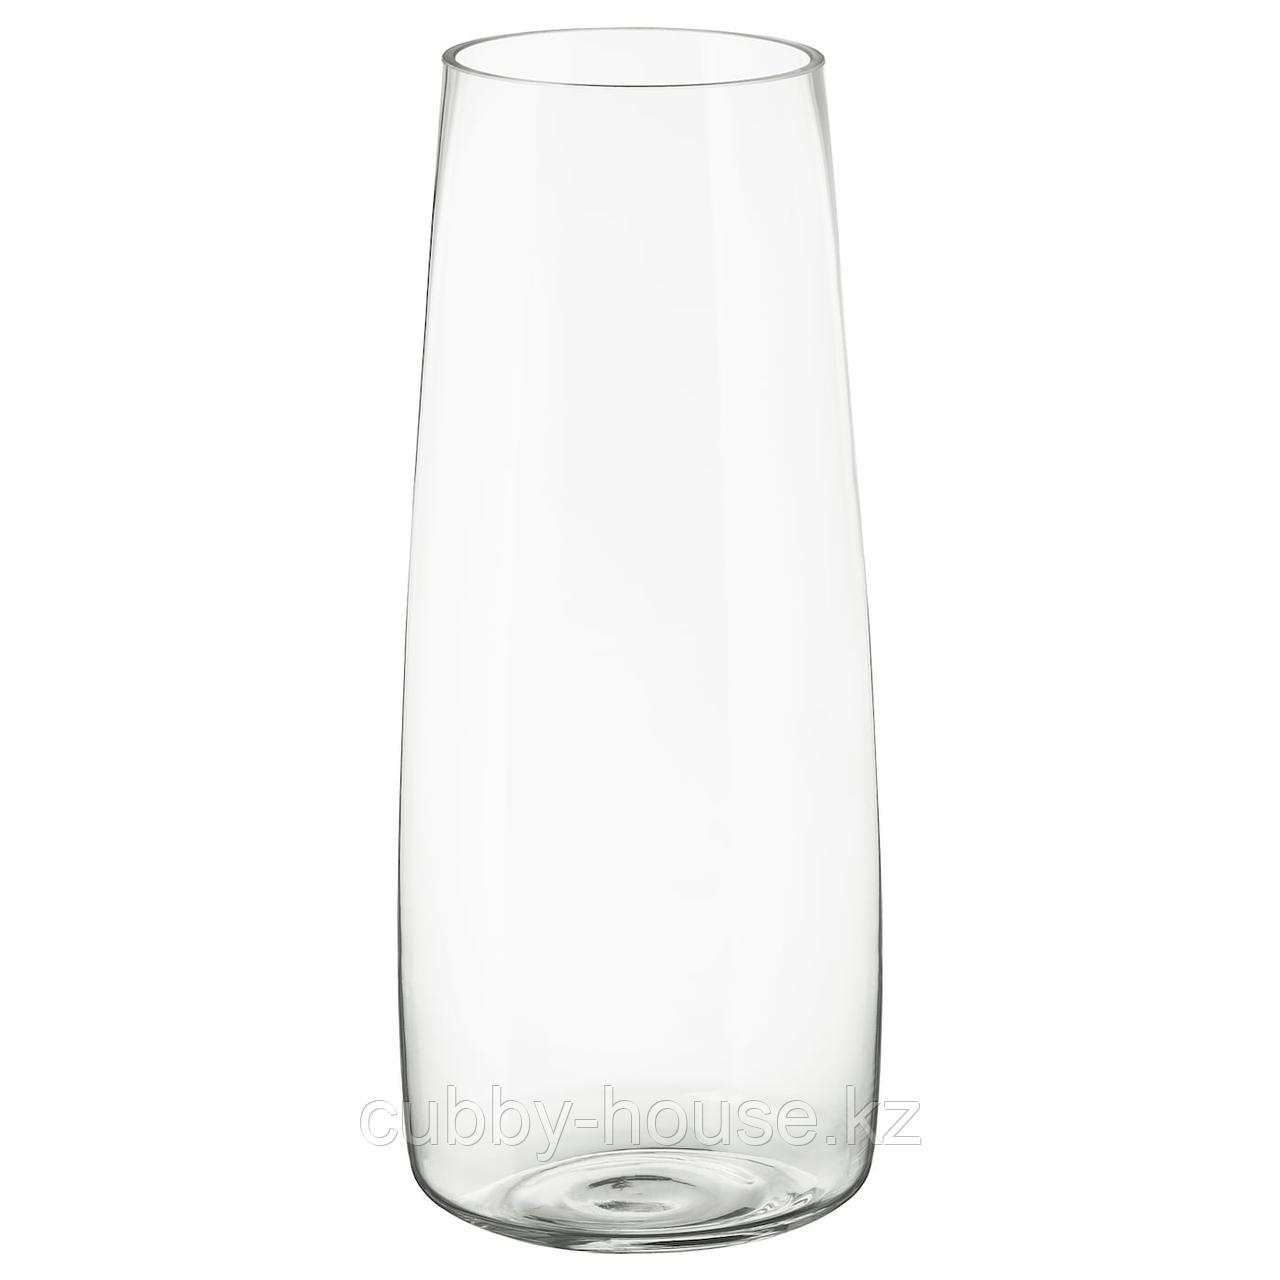 БЕРЭКНА Ваза, прозрачное стекло, 45 см